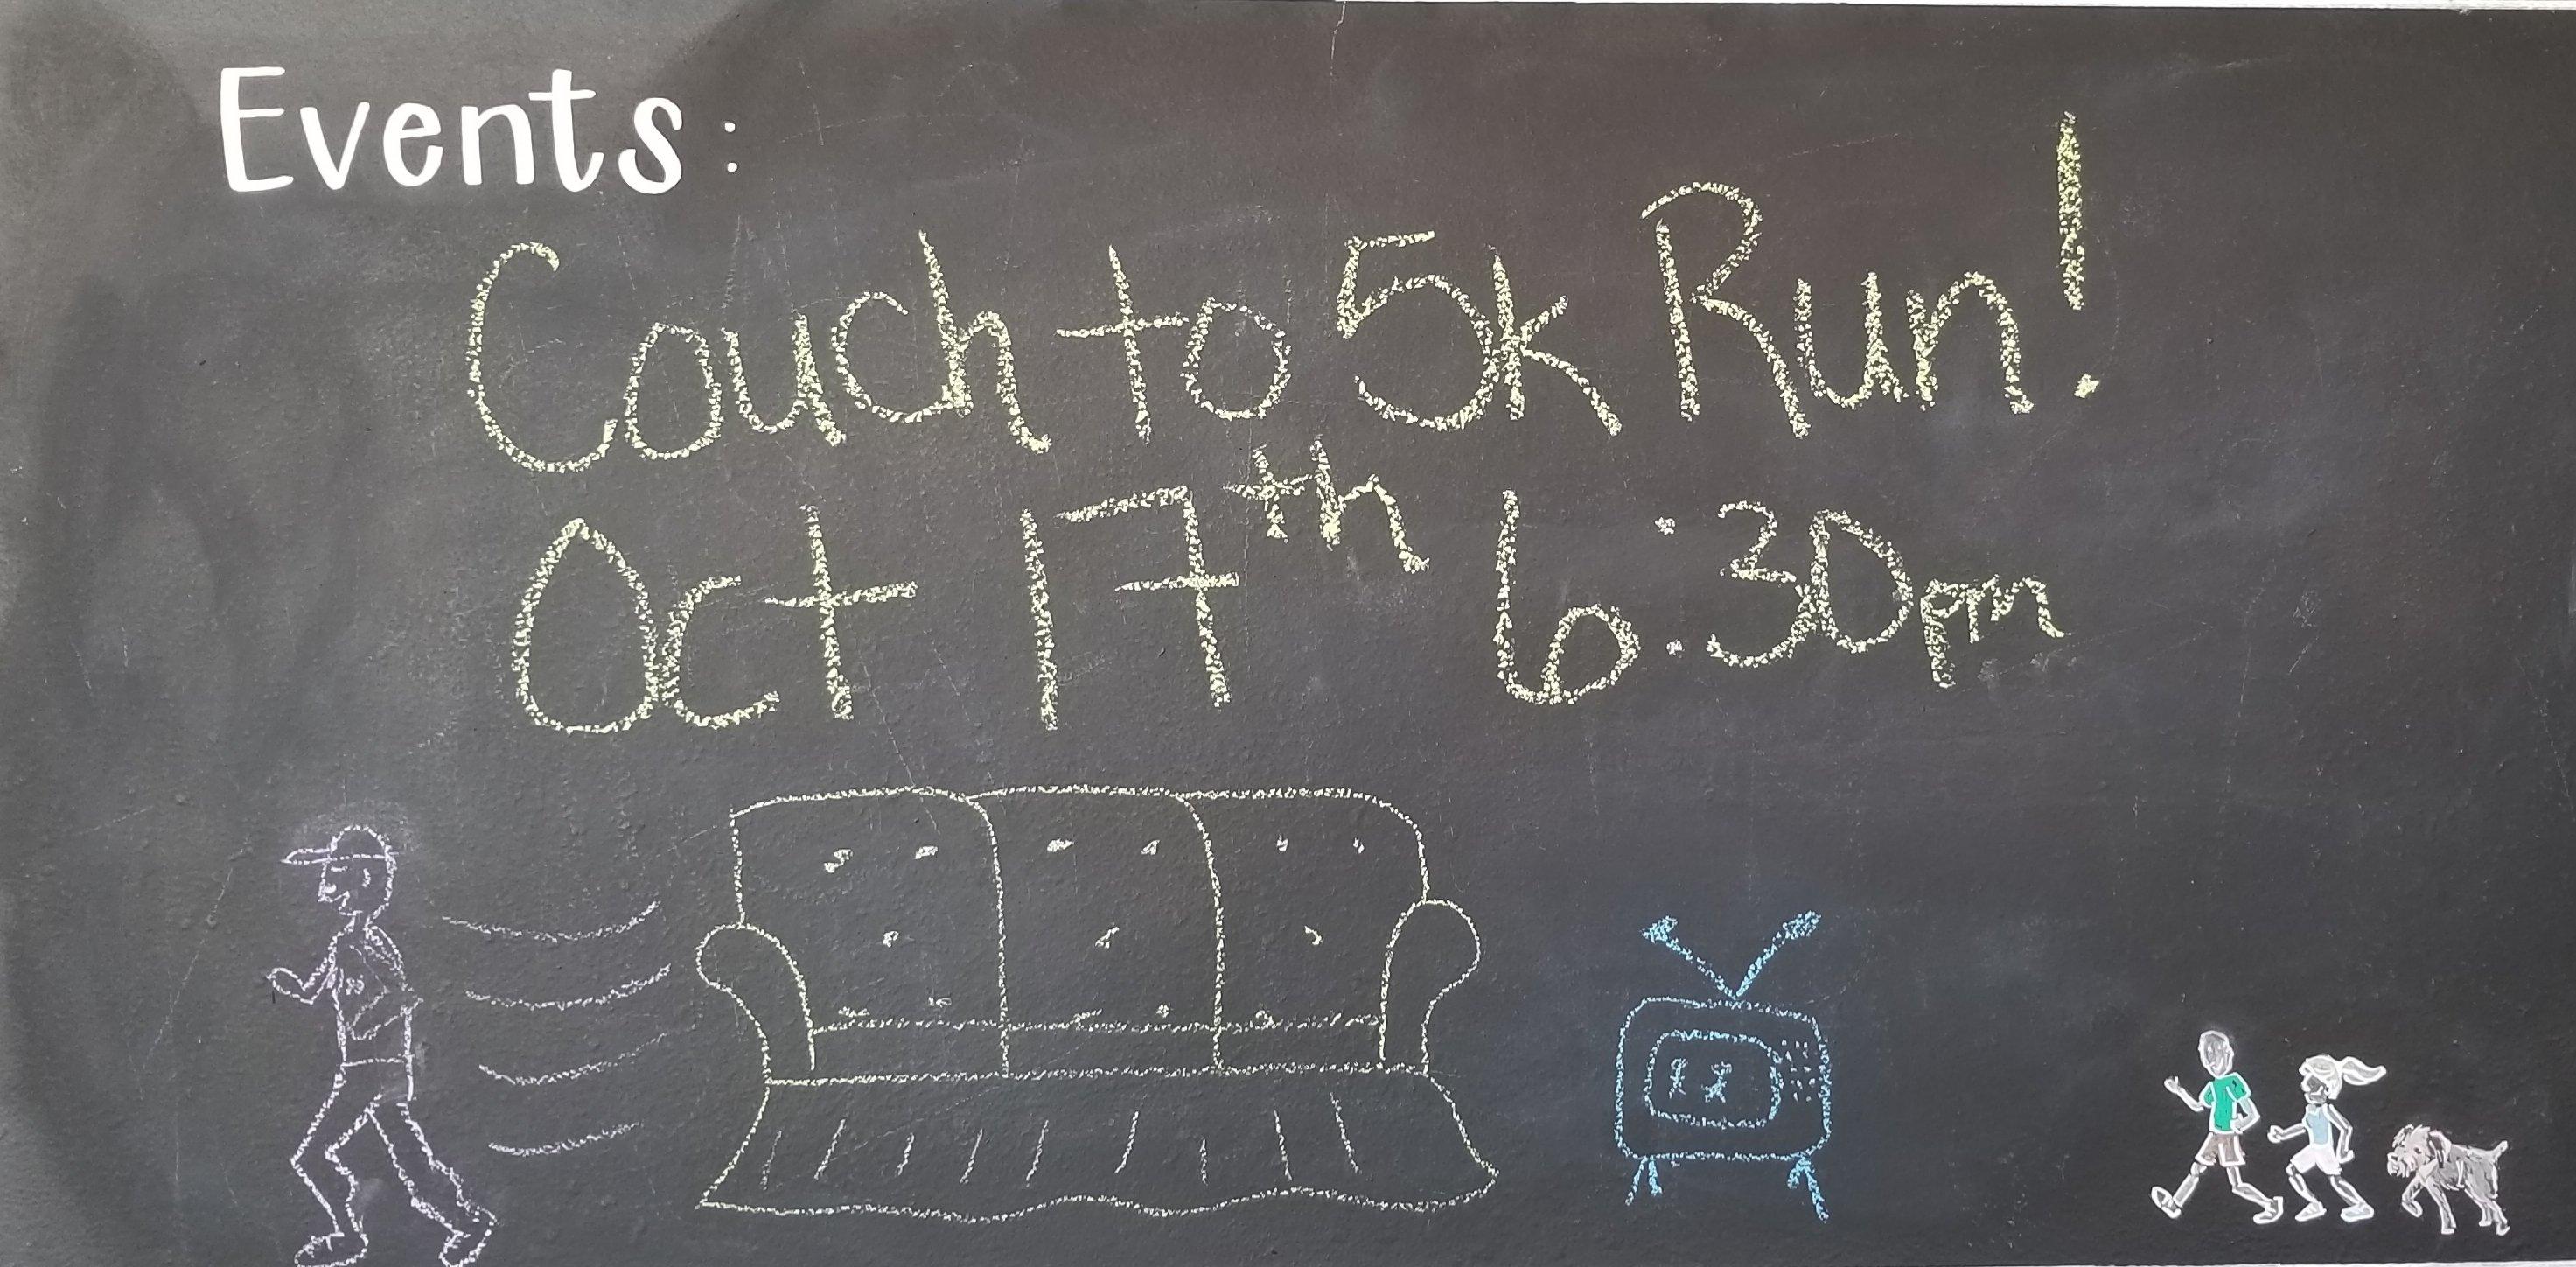 Couch to 5k, Pearson Chiropractic, Turkey Trot, 5k, ASD, Auburn Public Schools Foundation